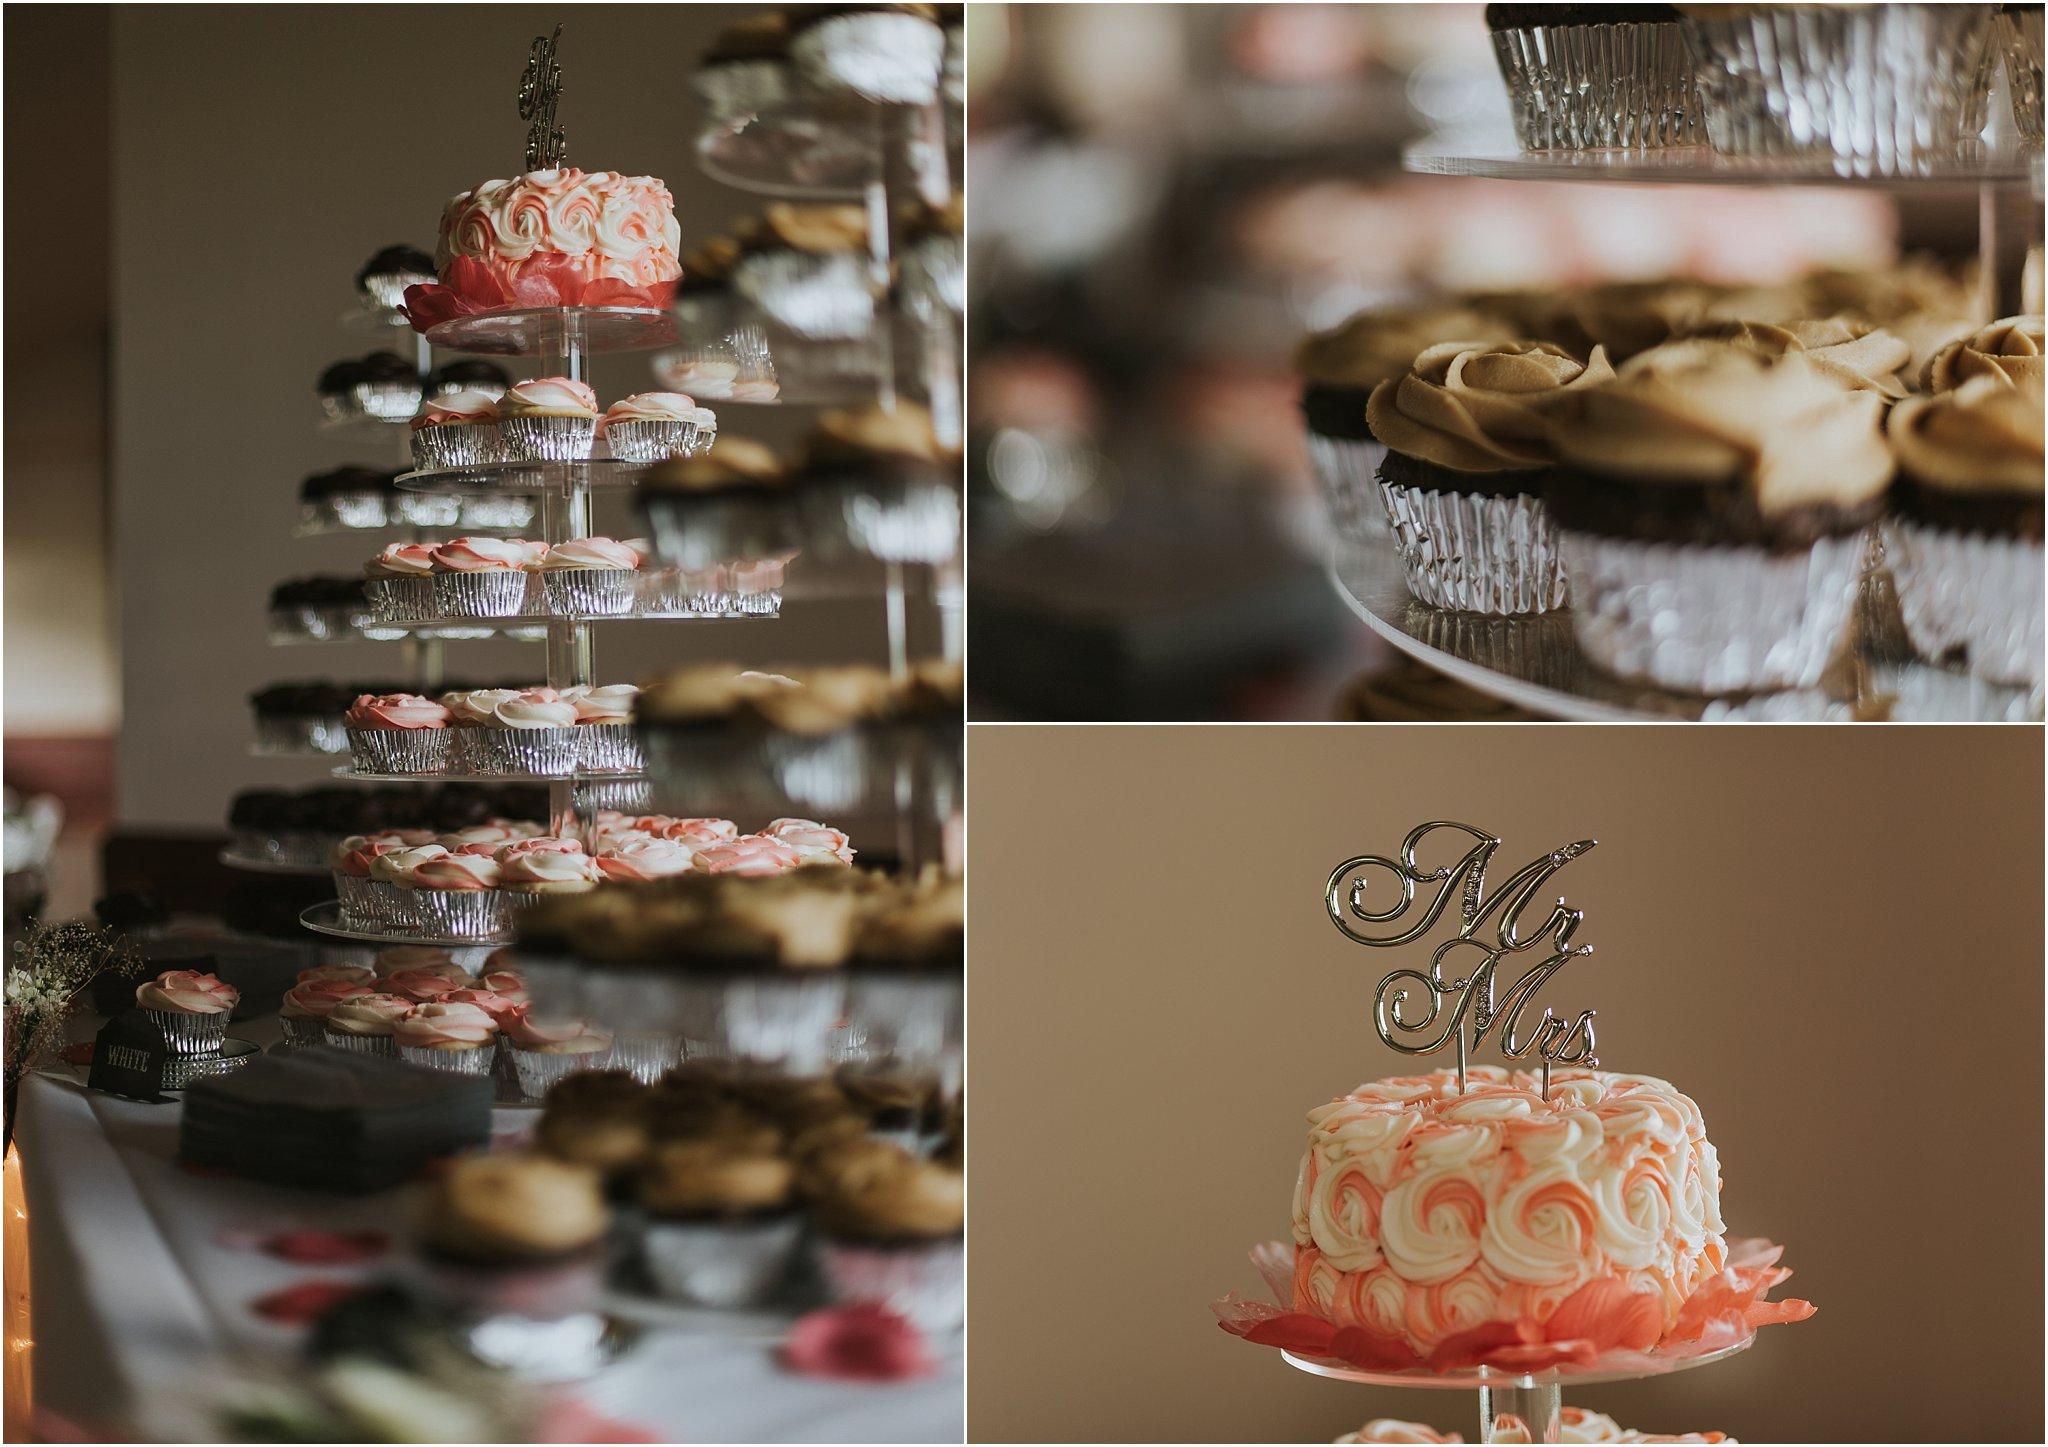 cake detail shots